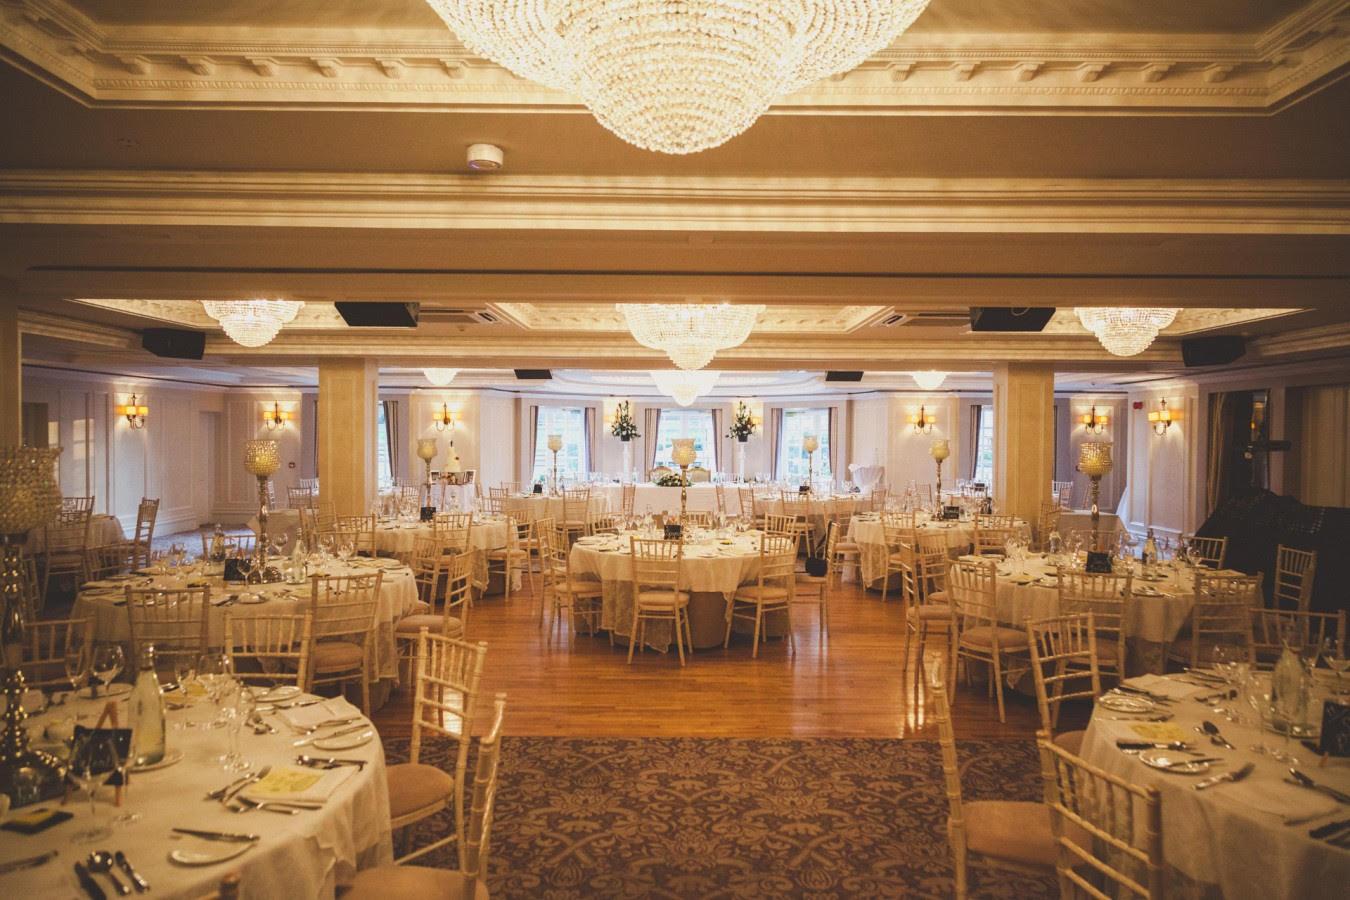 Castle Wedding Venues: Bellingham Castle Wedding Venue